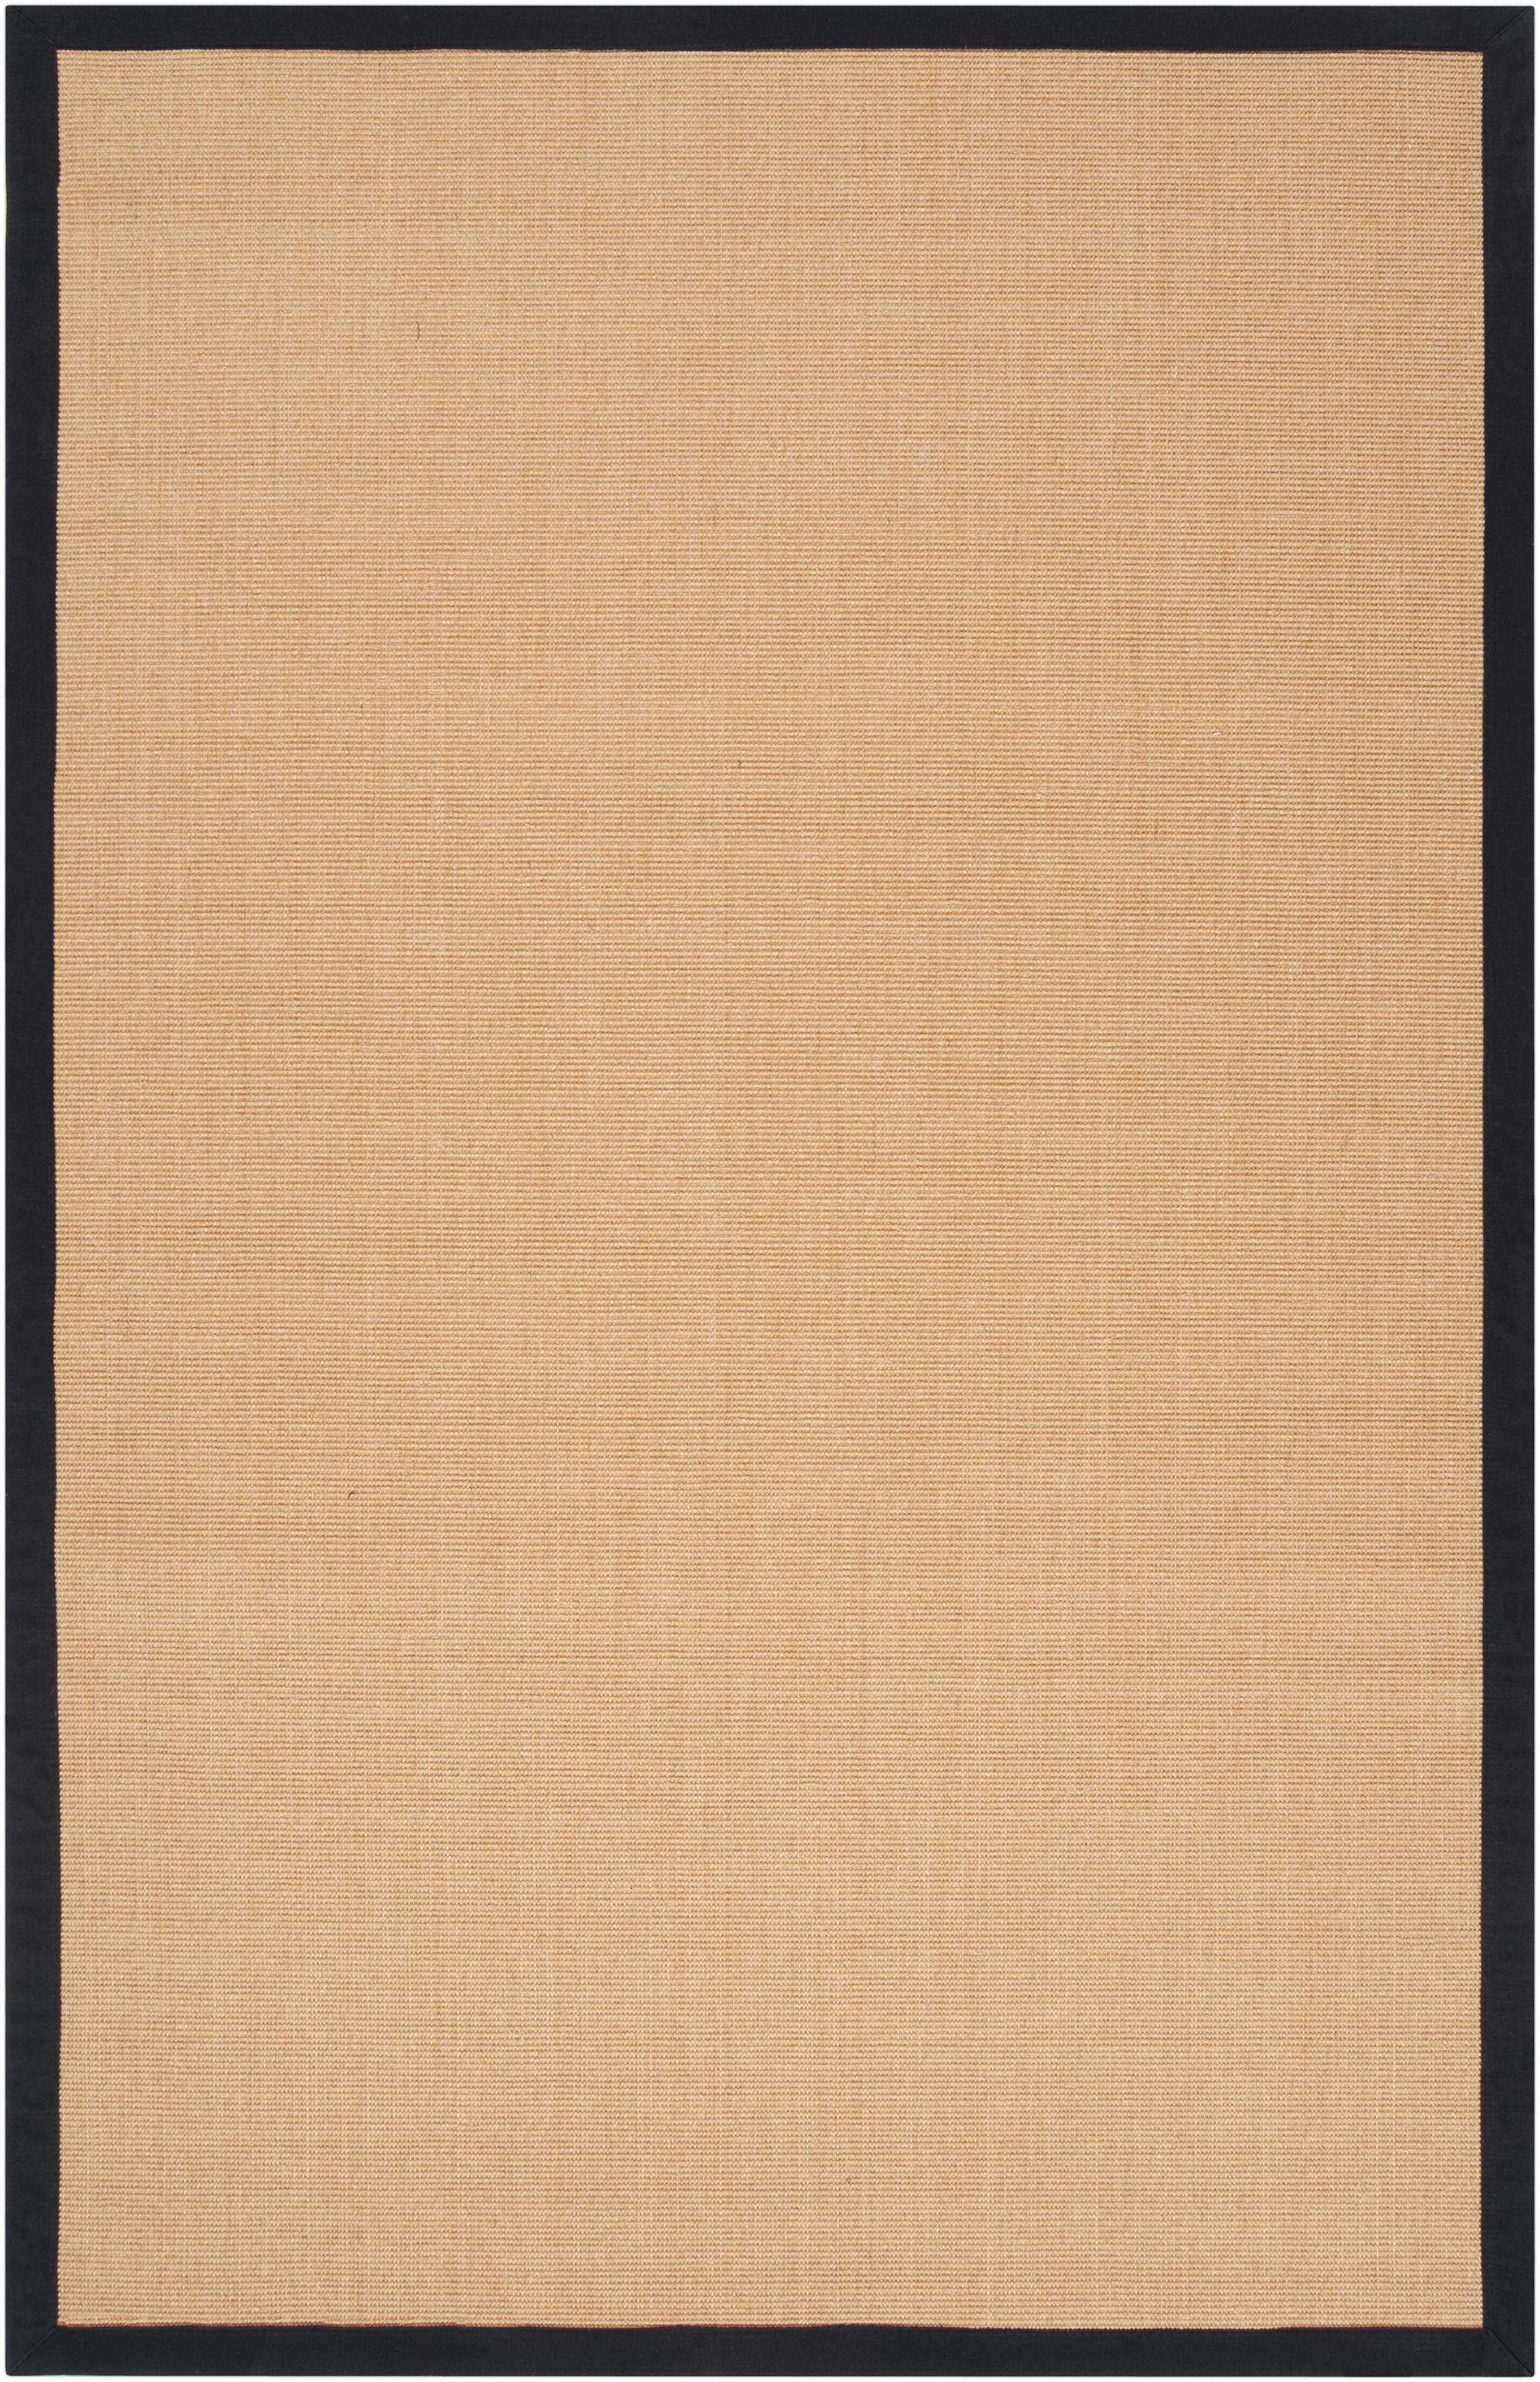 Surya Rugs Clinton 8' x 10' - Item Number: CLN9004-810